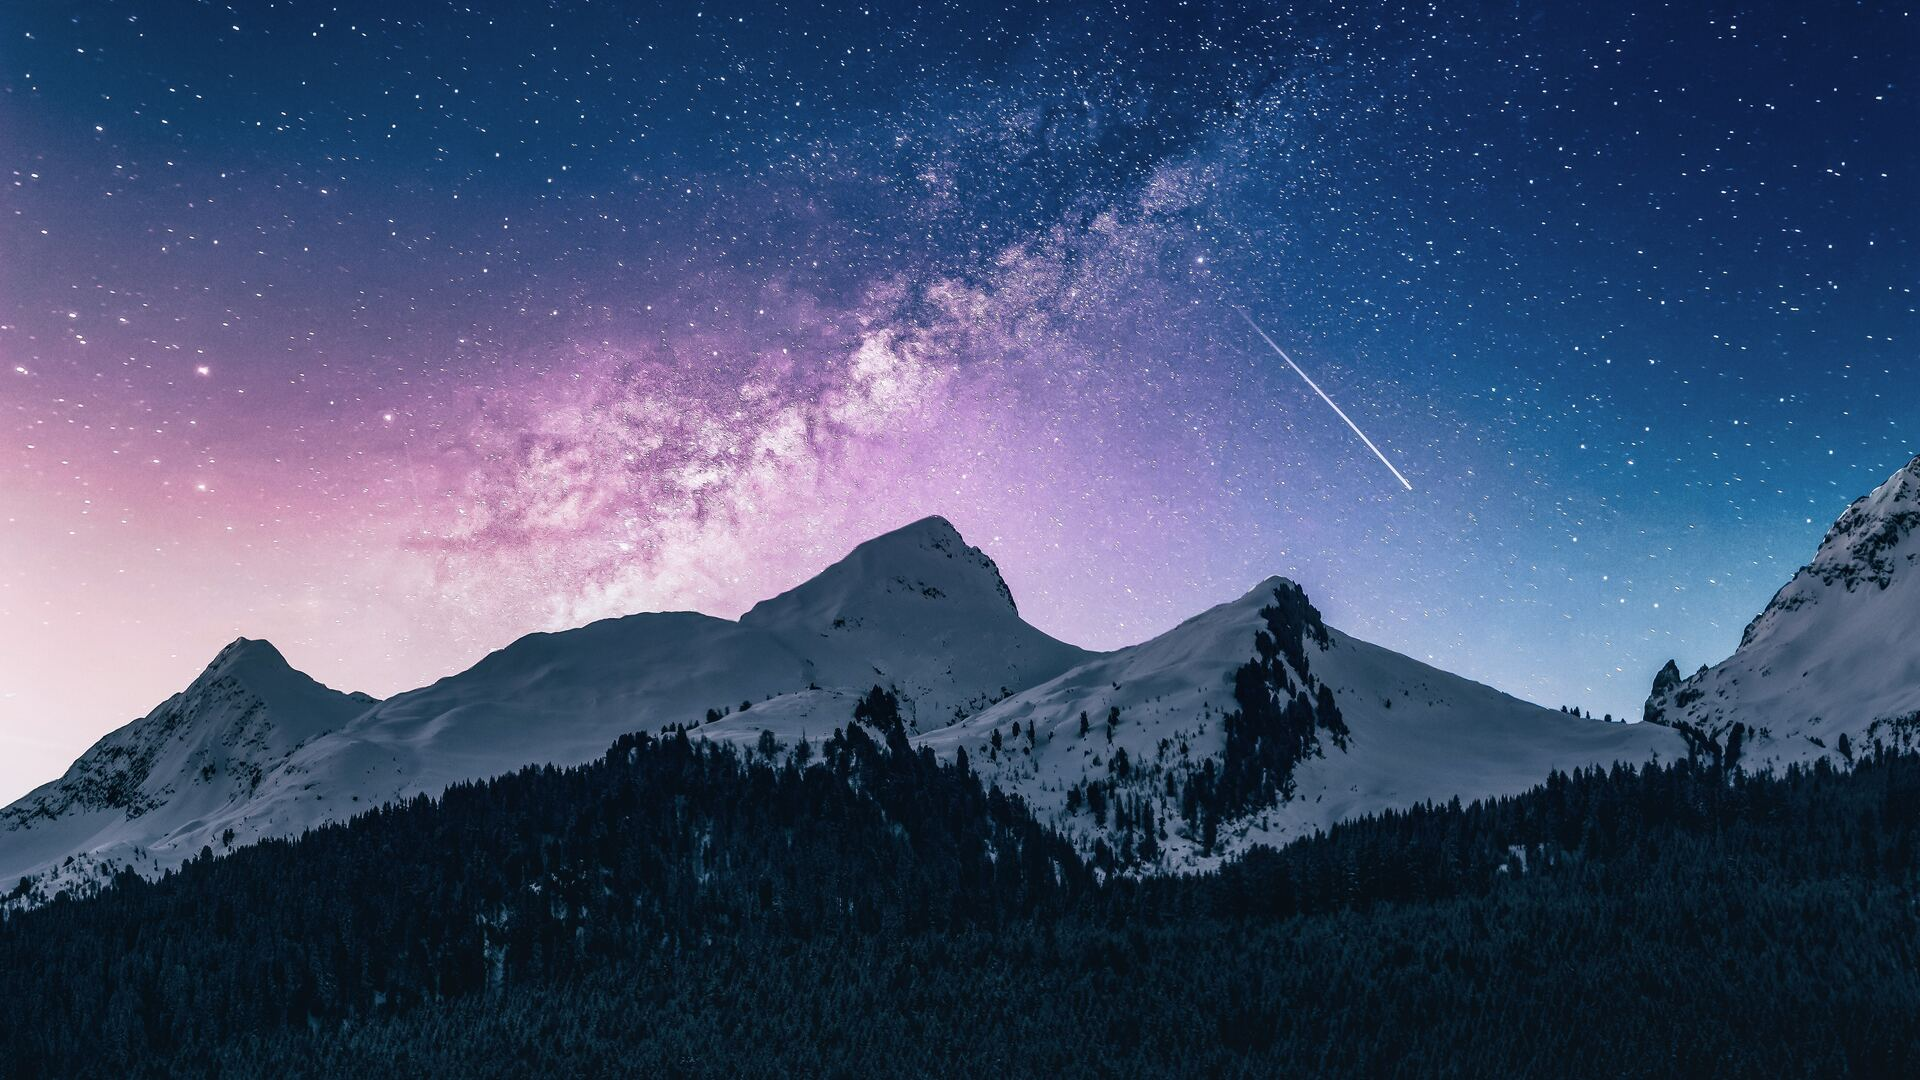 1920x1080 Landscape Outdoor Mountains Galaxy 4k Laptop ...